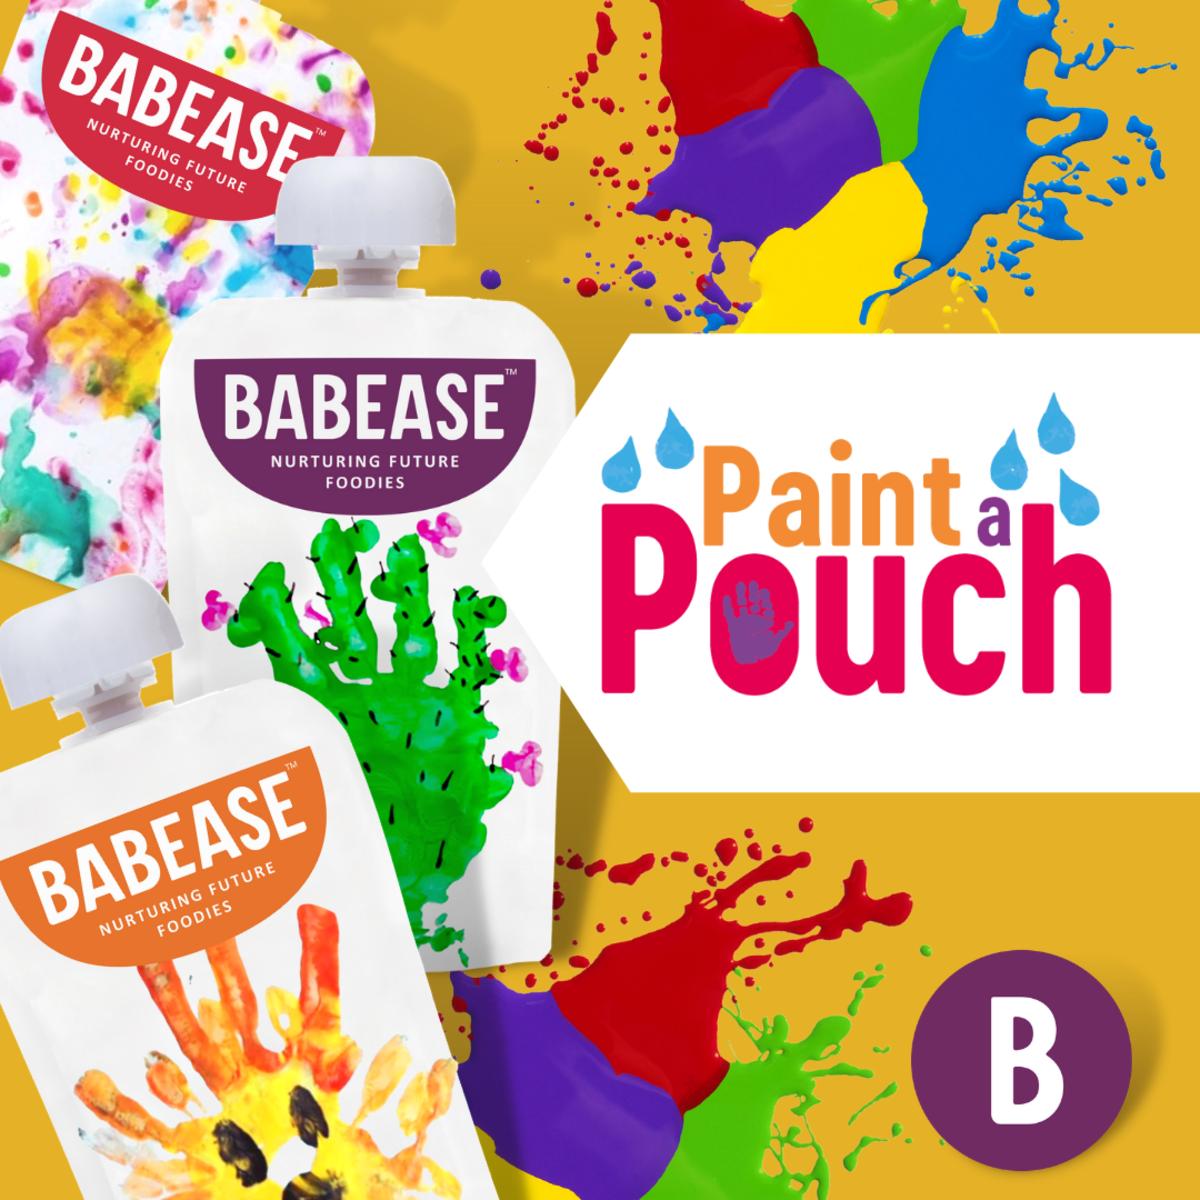 Paint a Pouch Competition